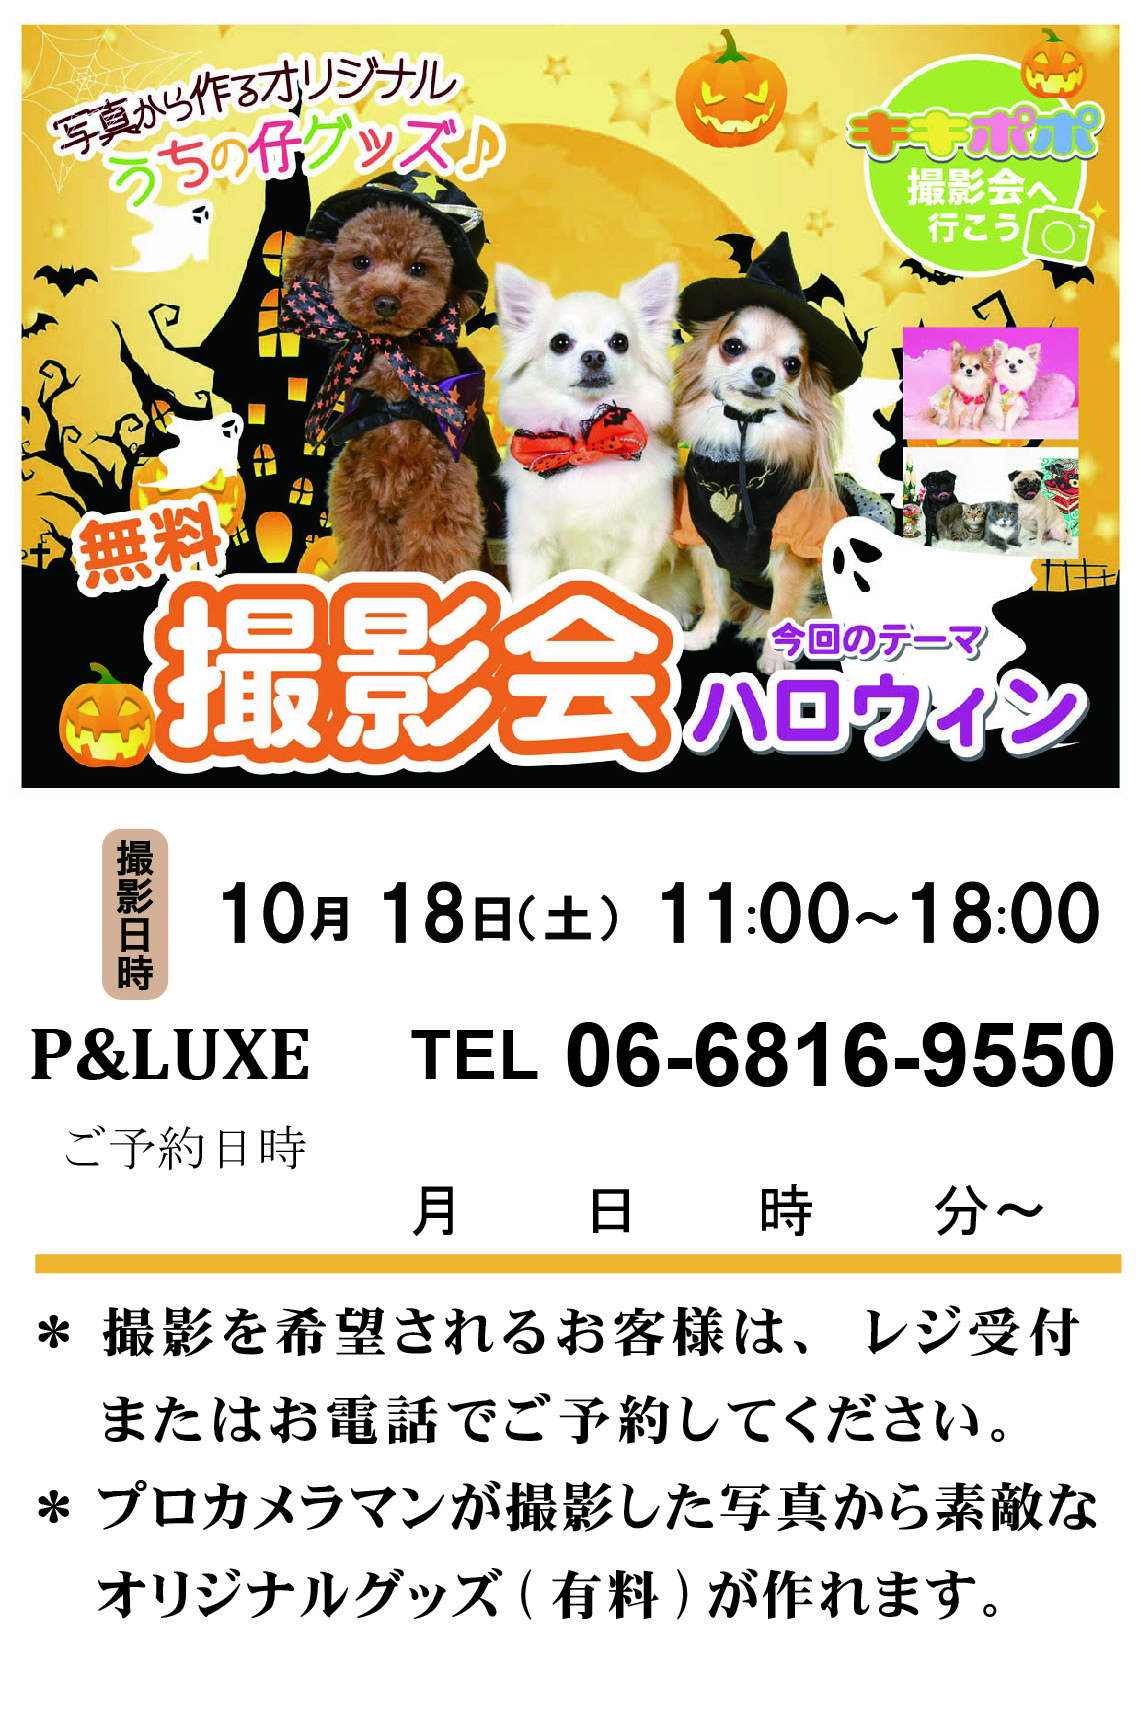 P&LUXE_チラシ.jpg